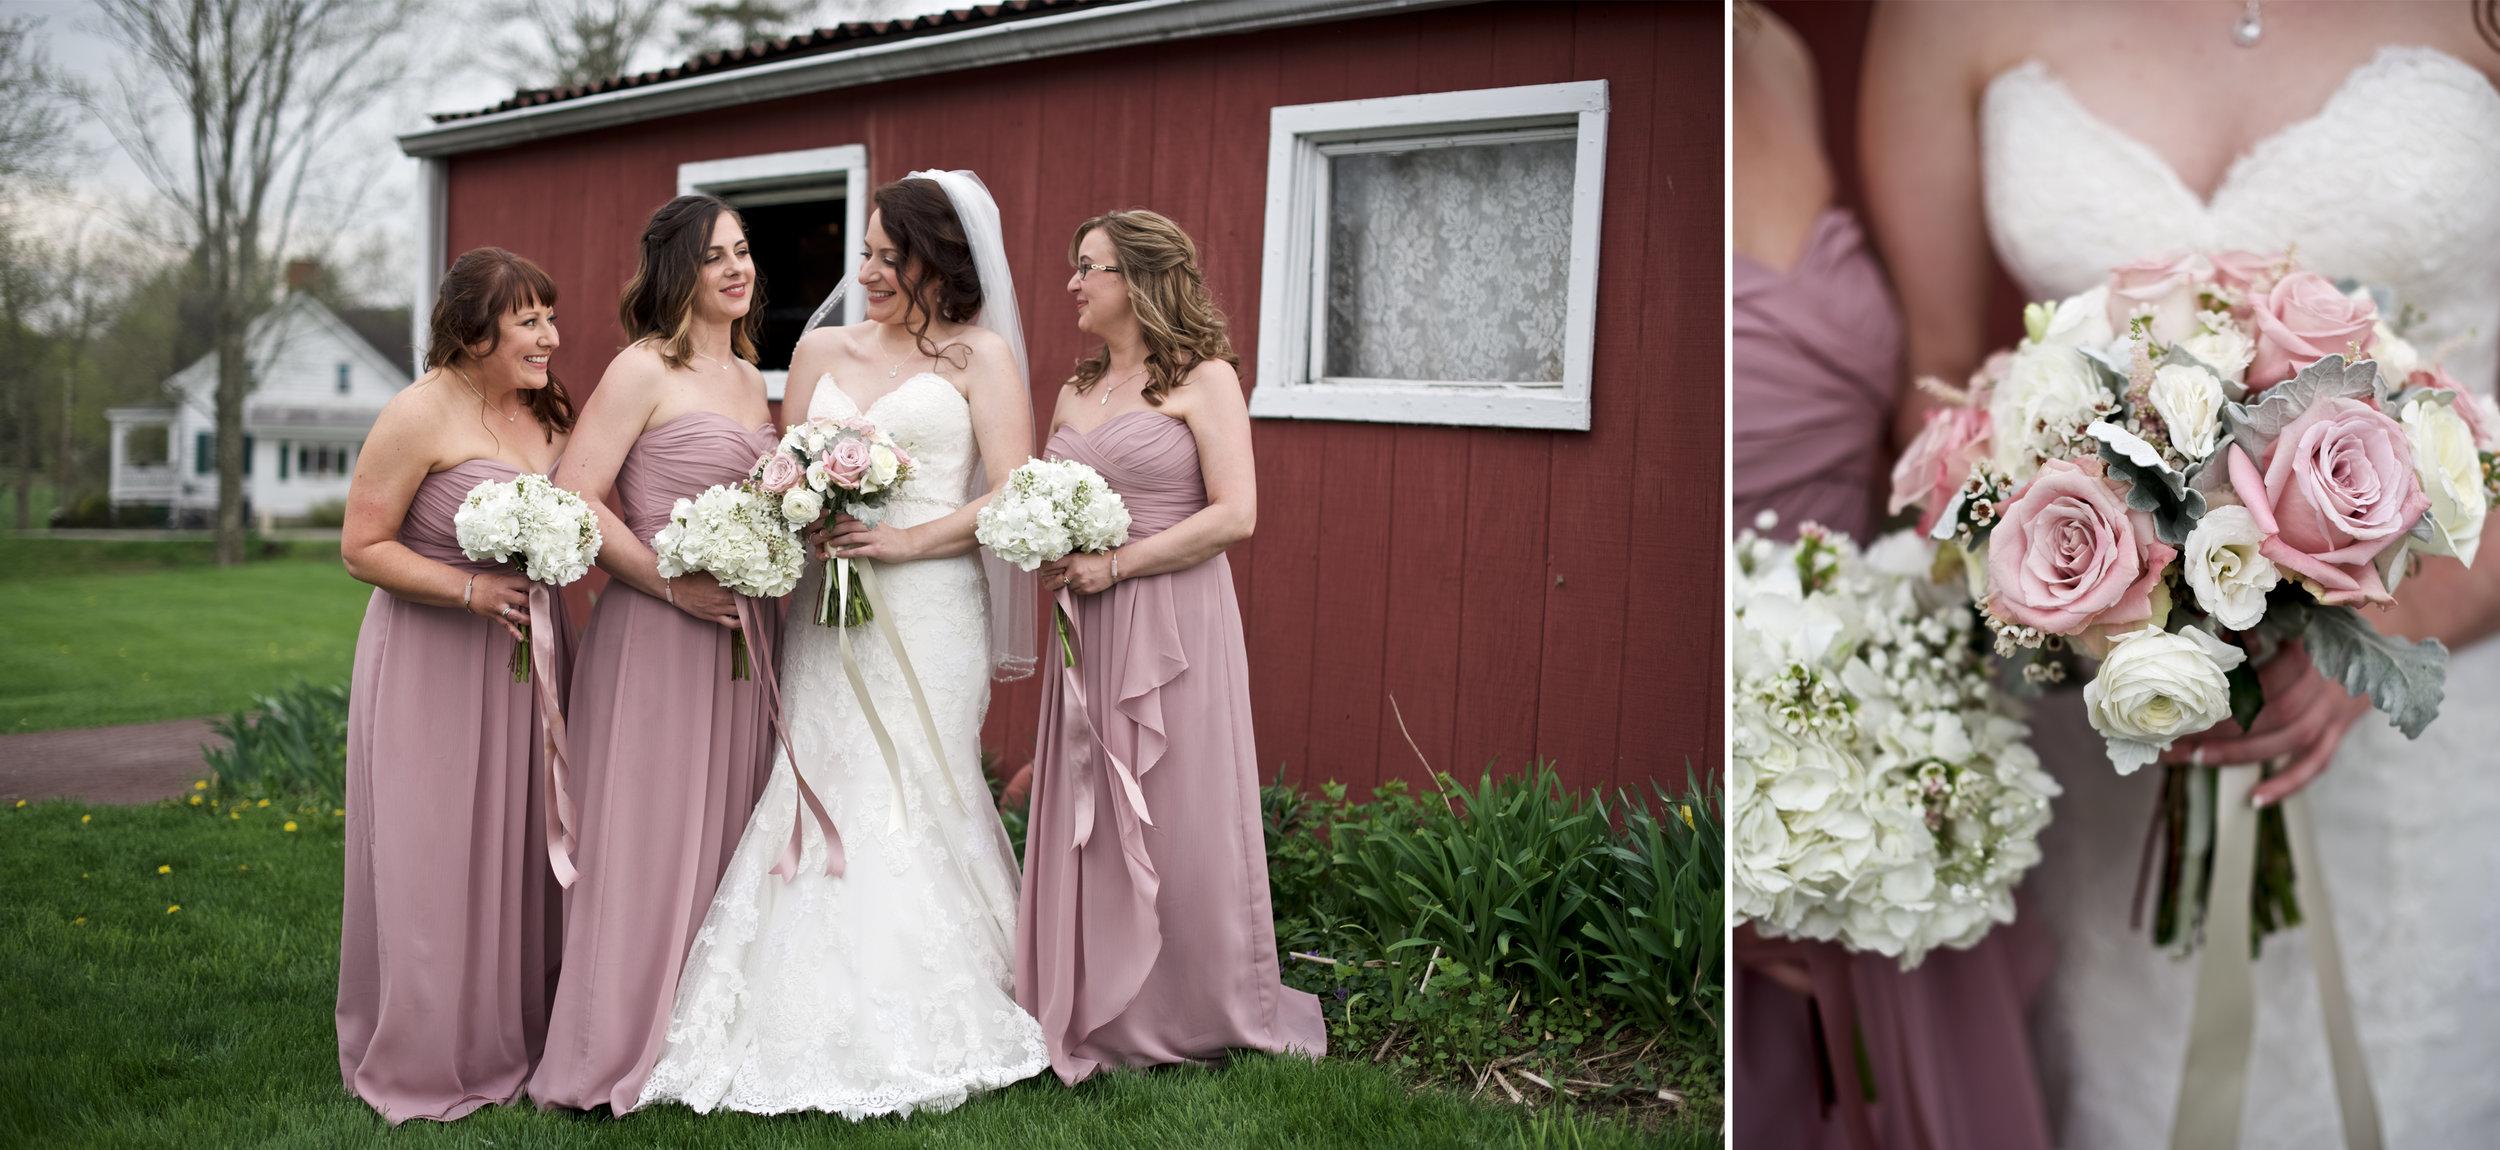 Lippincott manor wedding, wallkill ny wedding, photography, photos x.jpg